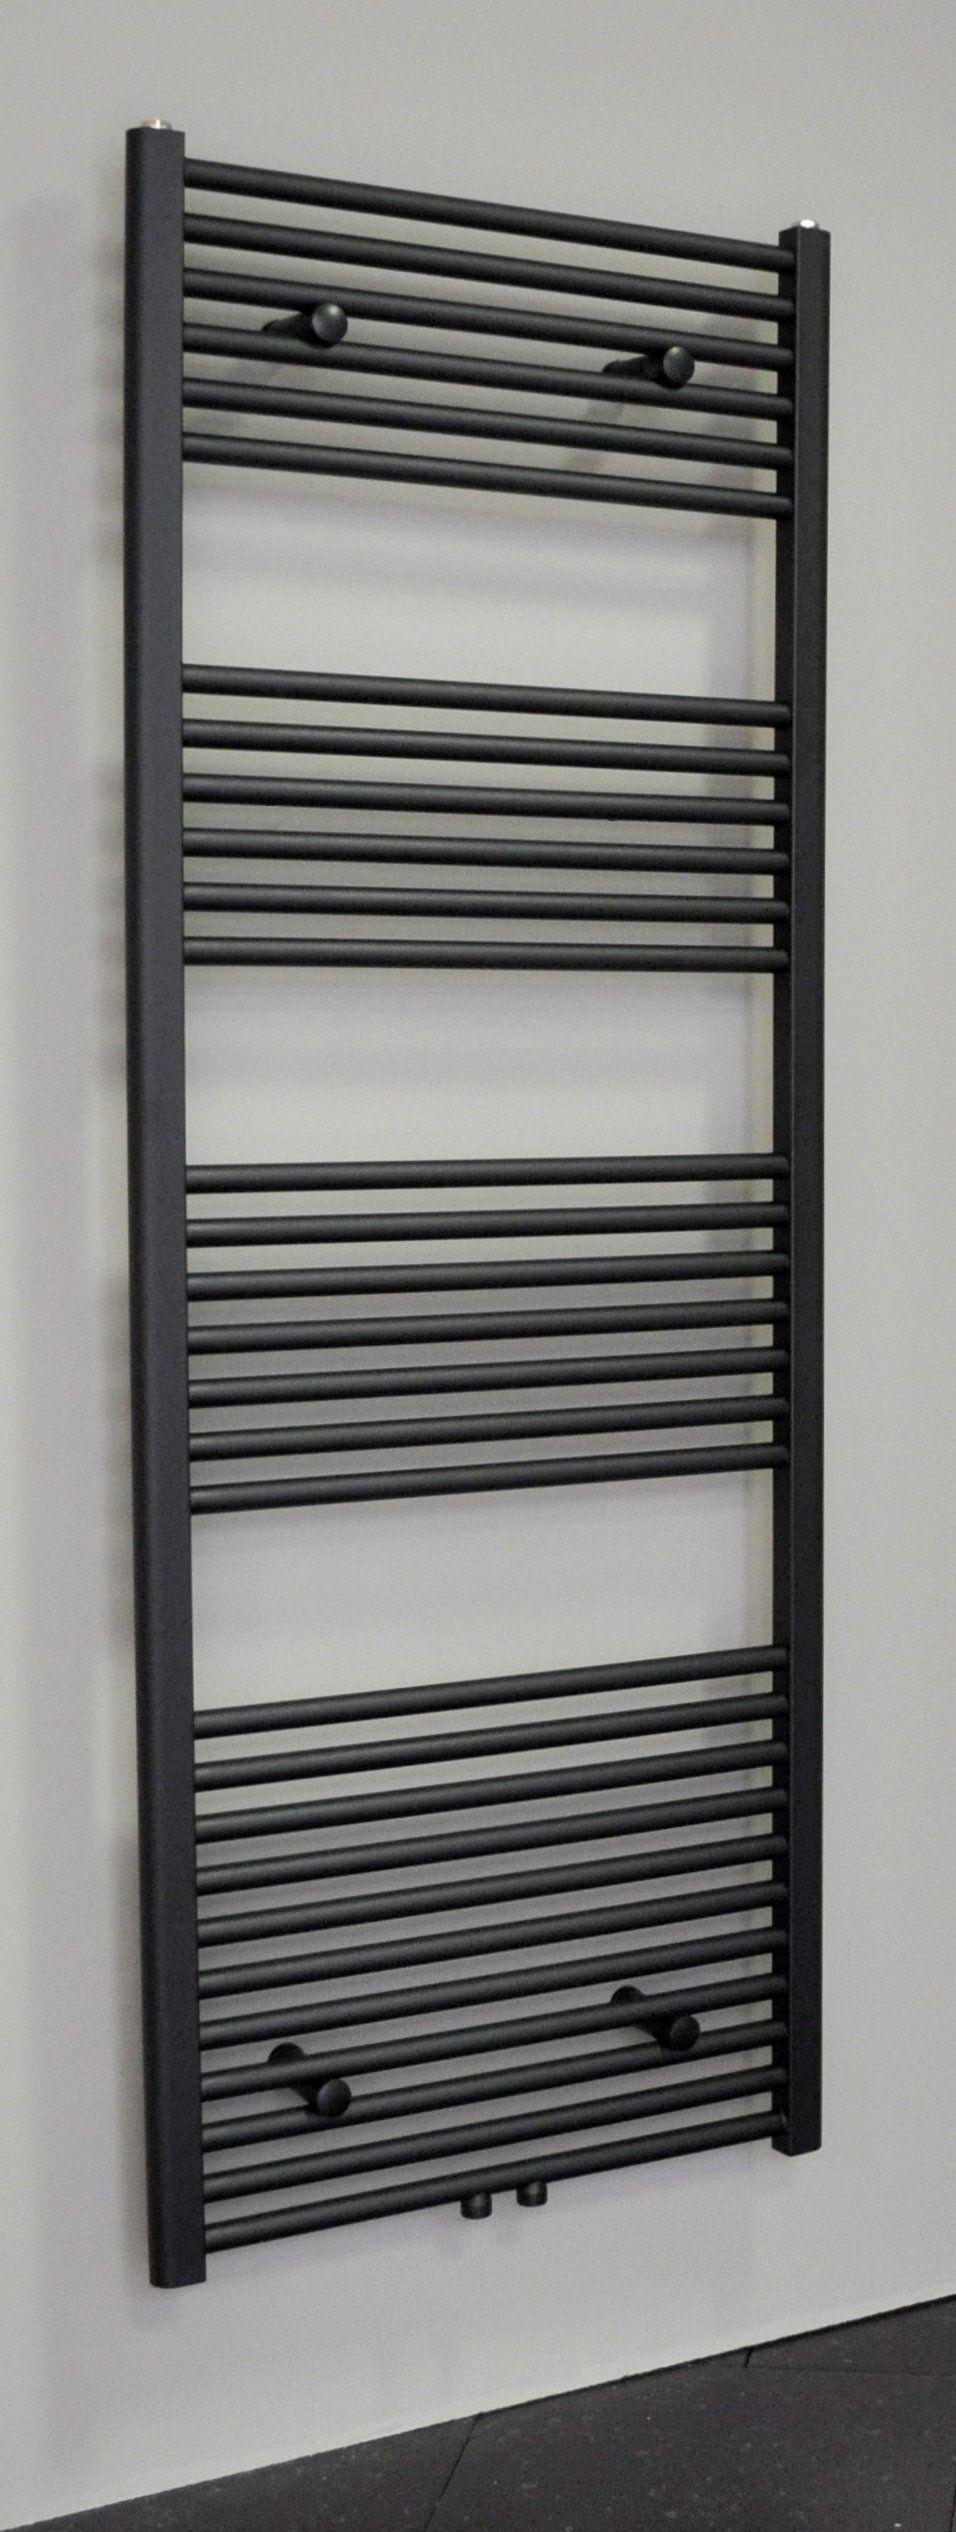 Sanicare design radiator midden aansluiting recht 160 x 60 cm. mat zwart